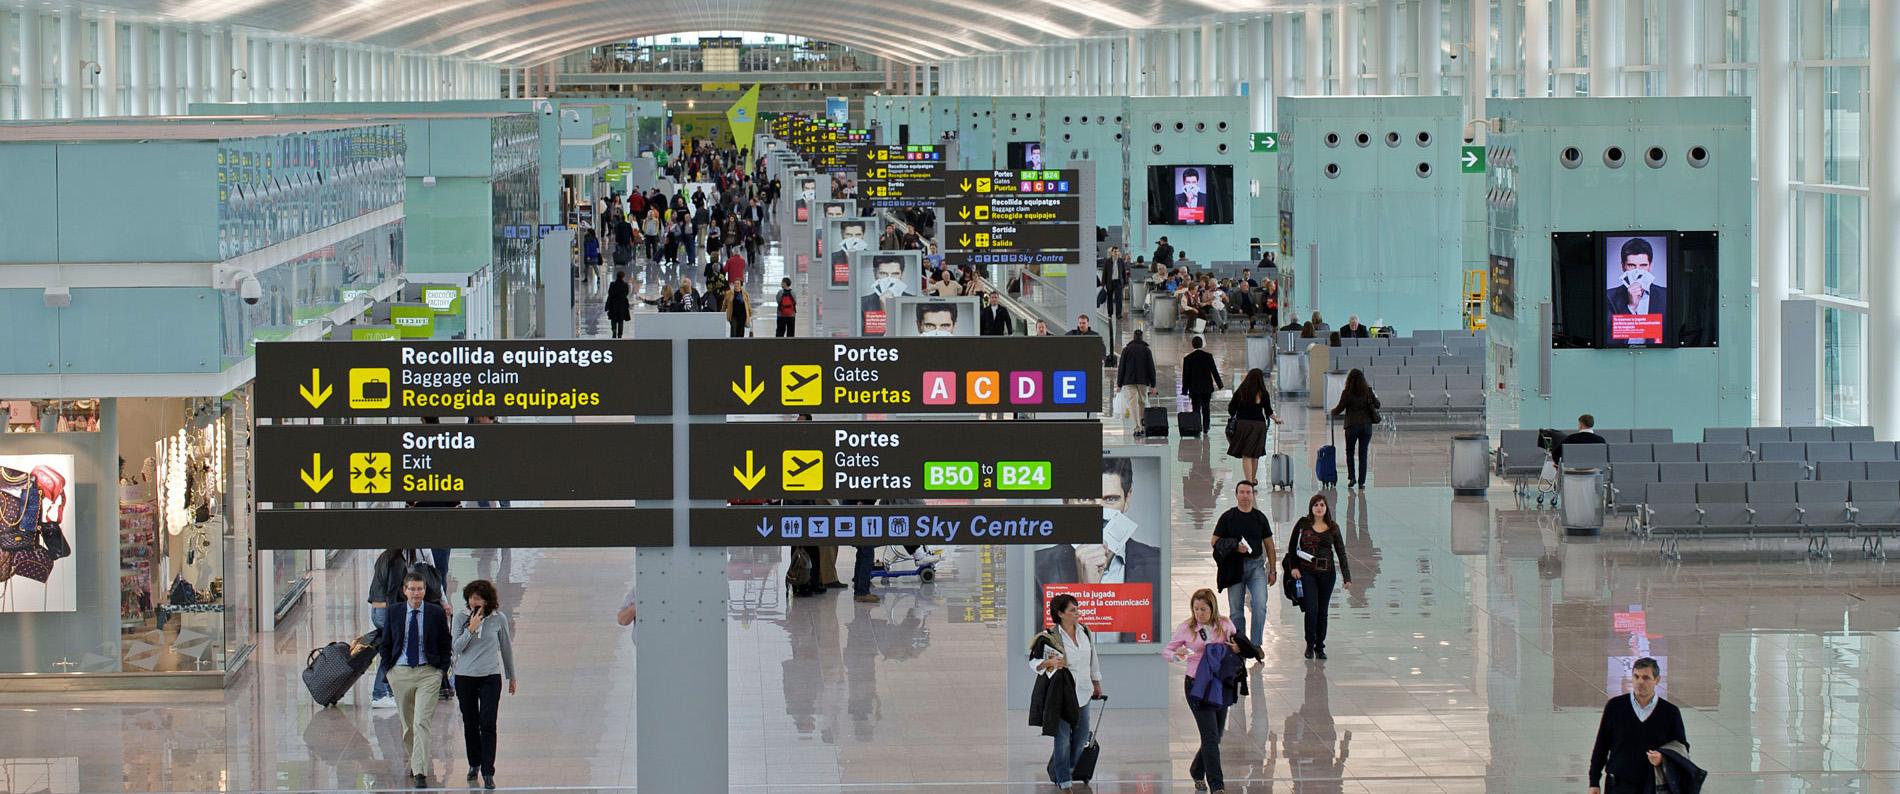 immoaugusta aeropuerto barcelona comprar piso barcelona vender piso barcelona